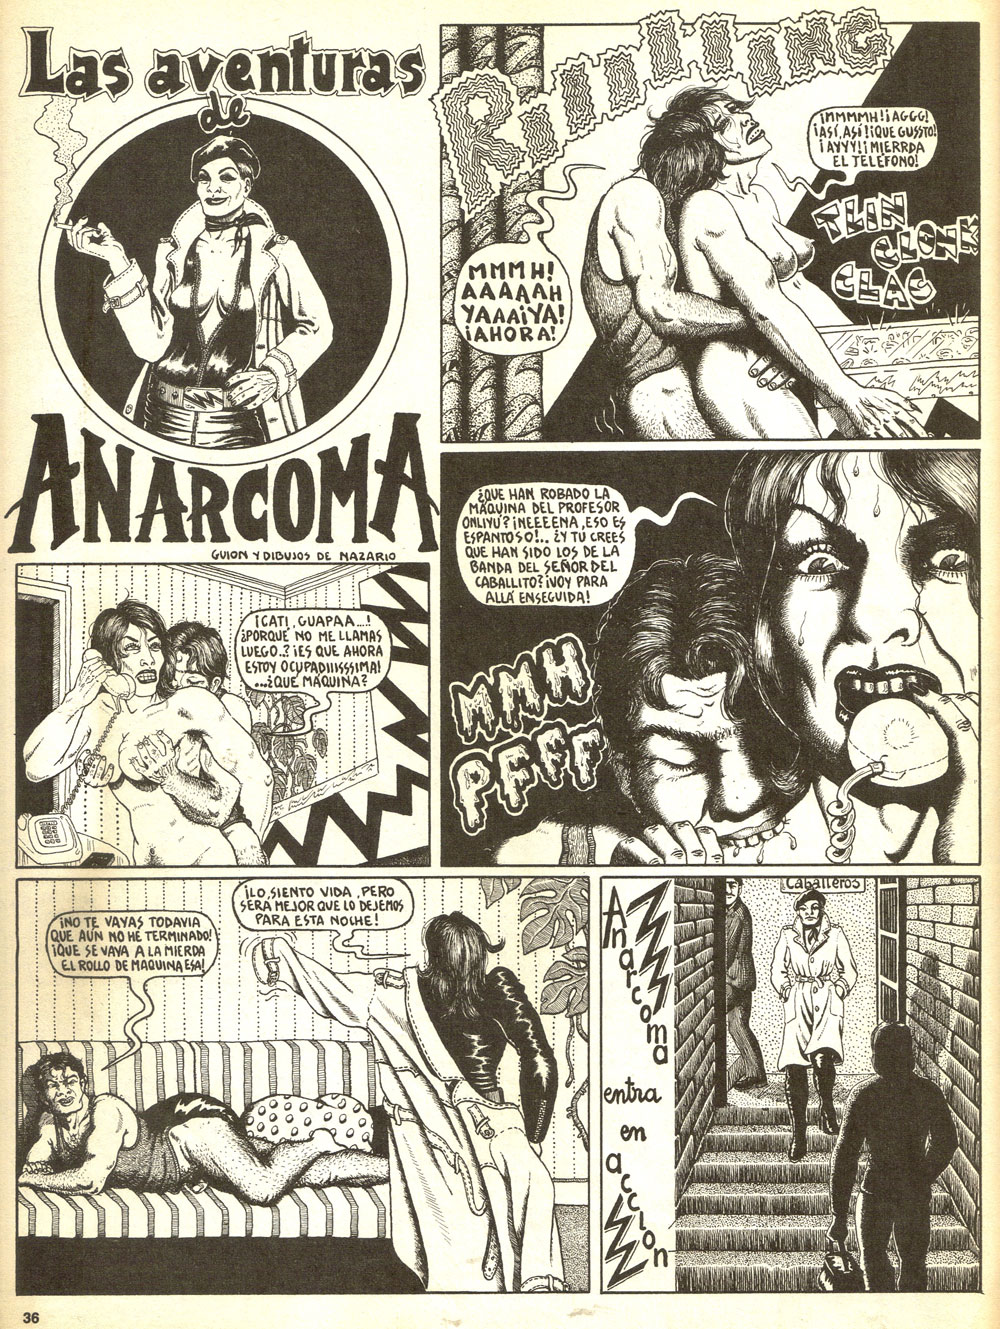 Las aventuras de Anarcoma , por Nazario